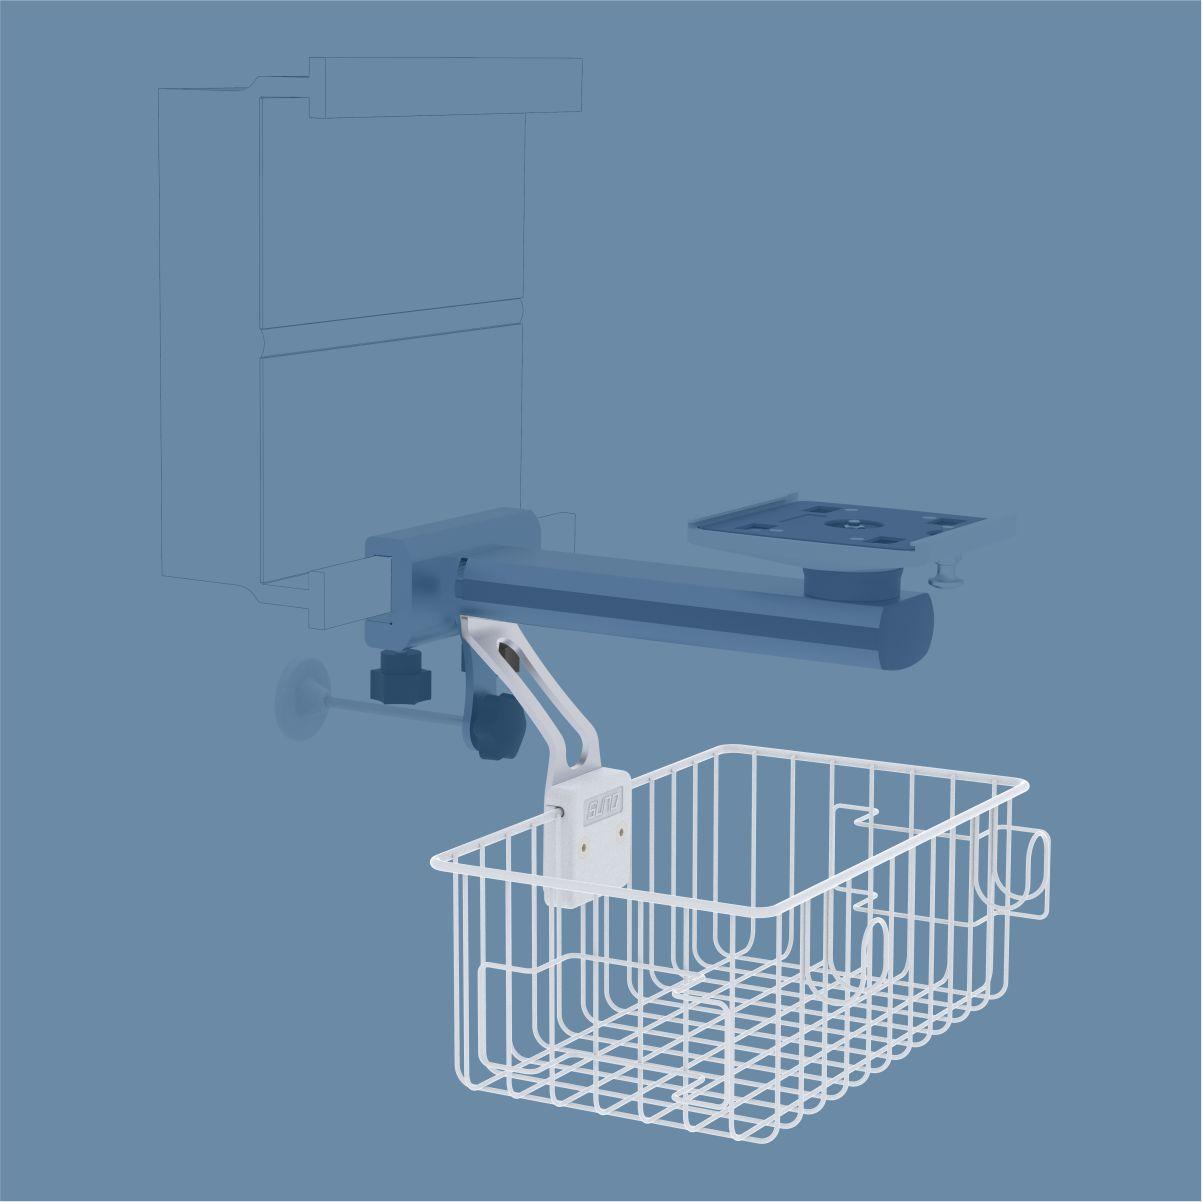 Medical Basket, Wire Basket and Cable Hook, Medical Cable Holder